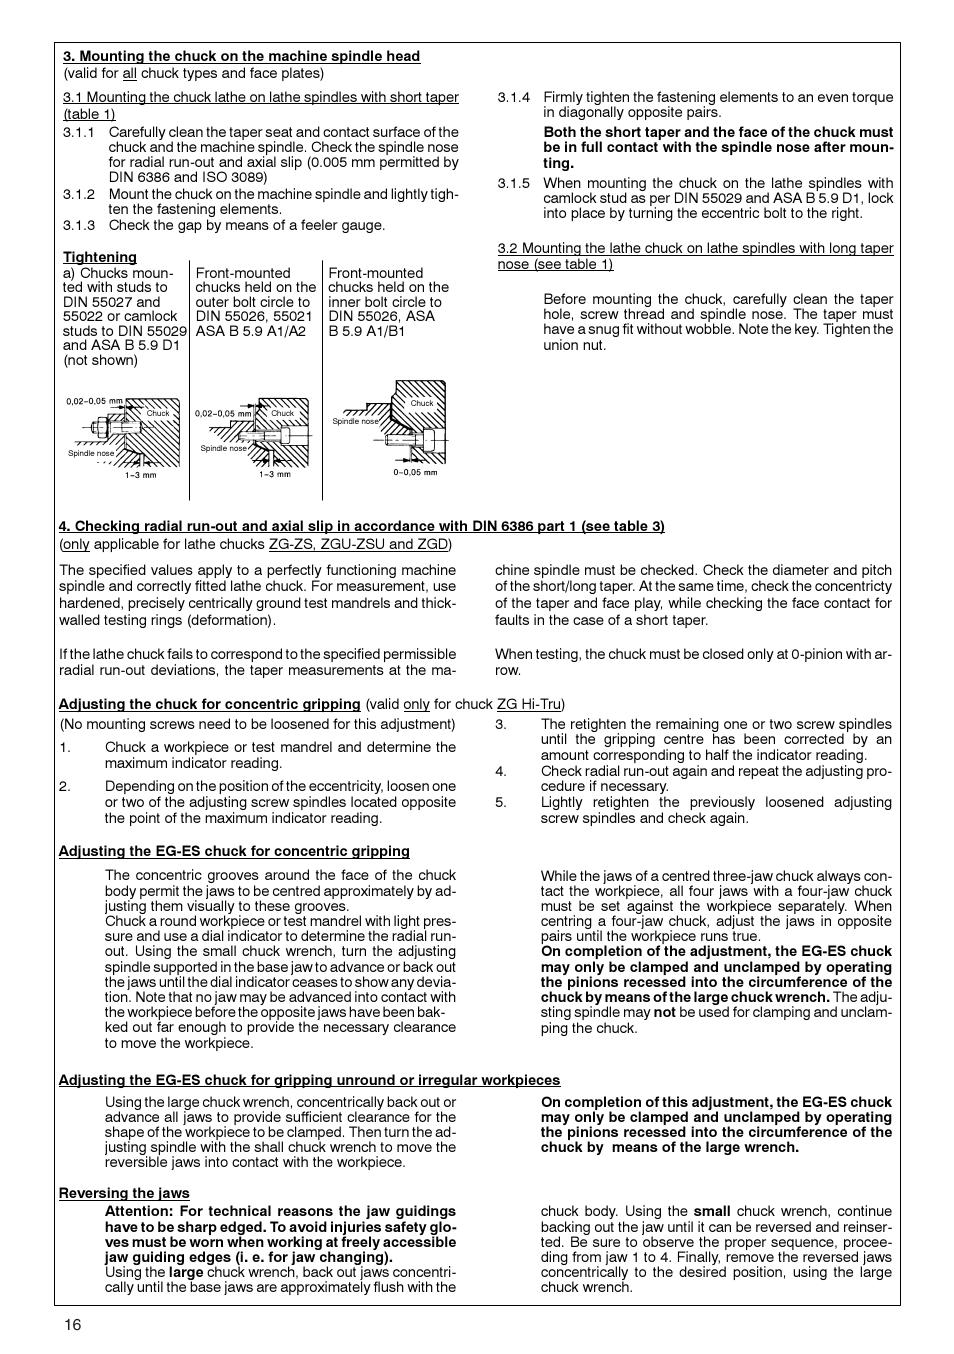 ROHM ZG/ZS, ZGU/ZSU, EG/ES - Geared scroll chucks User Manual | Page